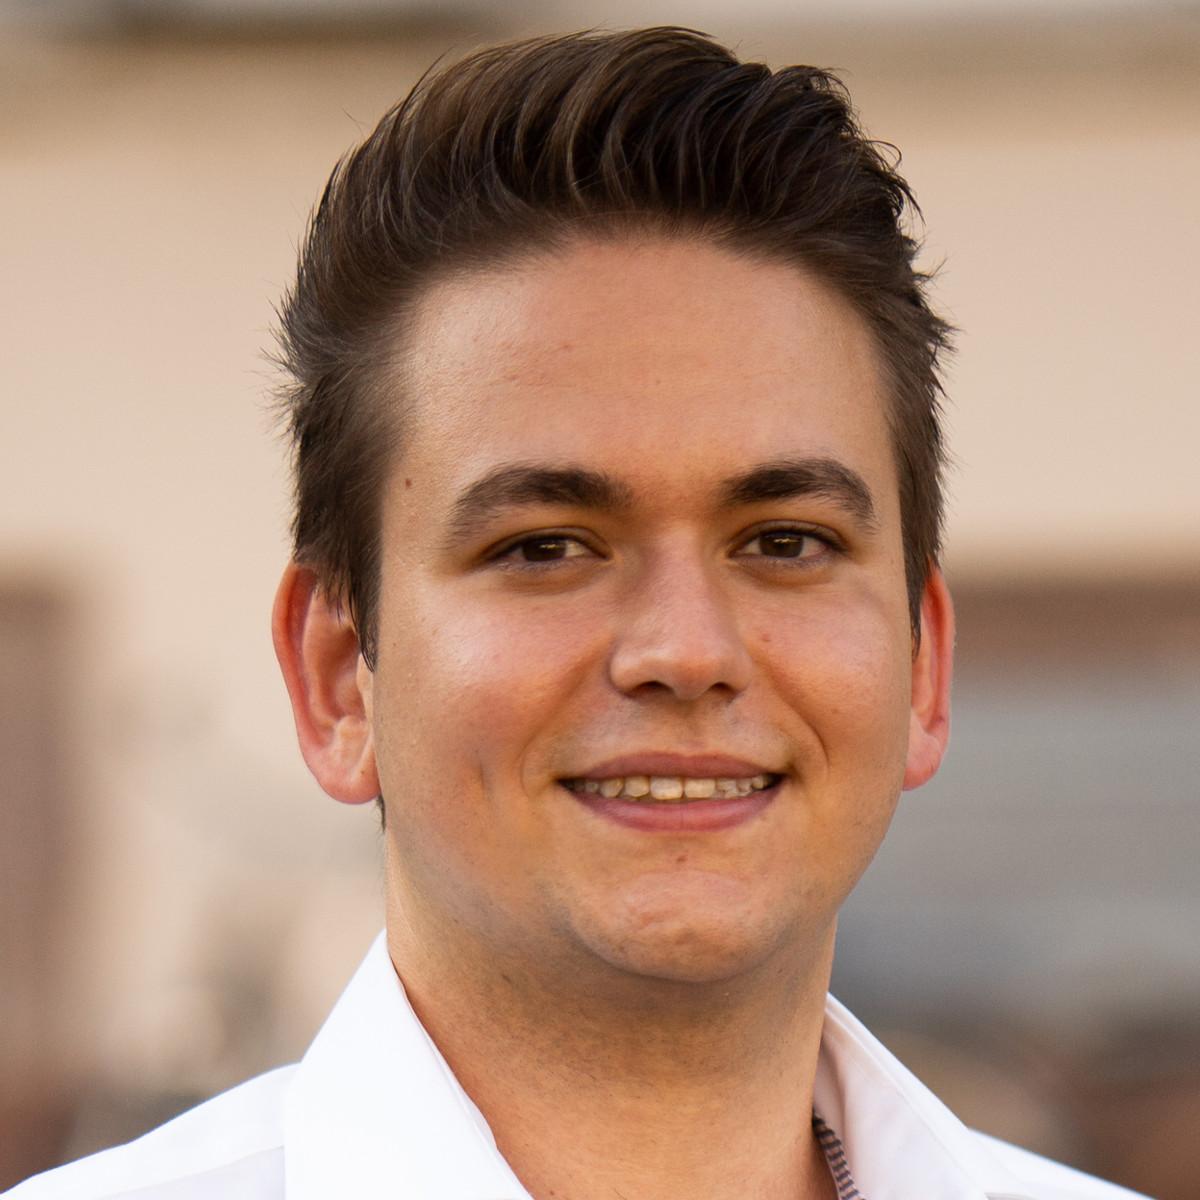 Julian Sanwald